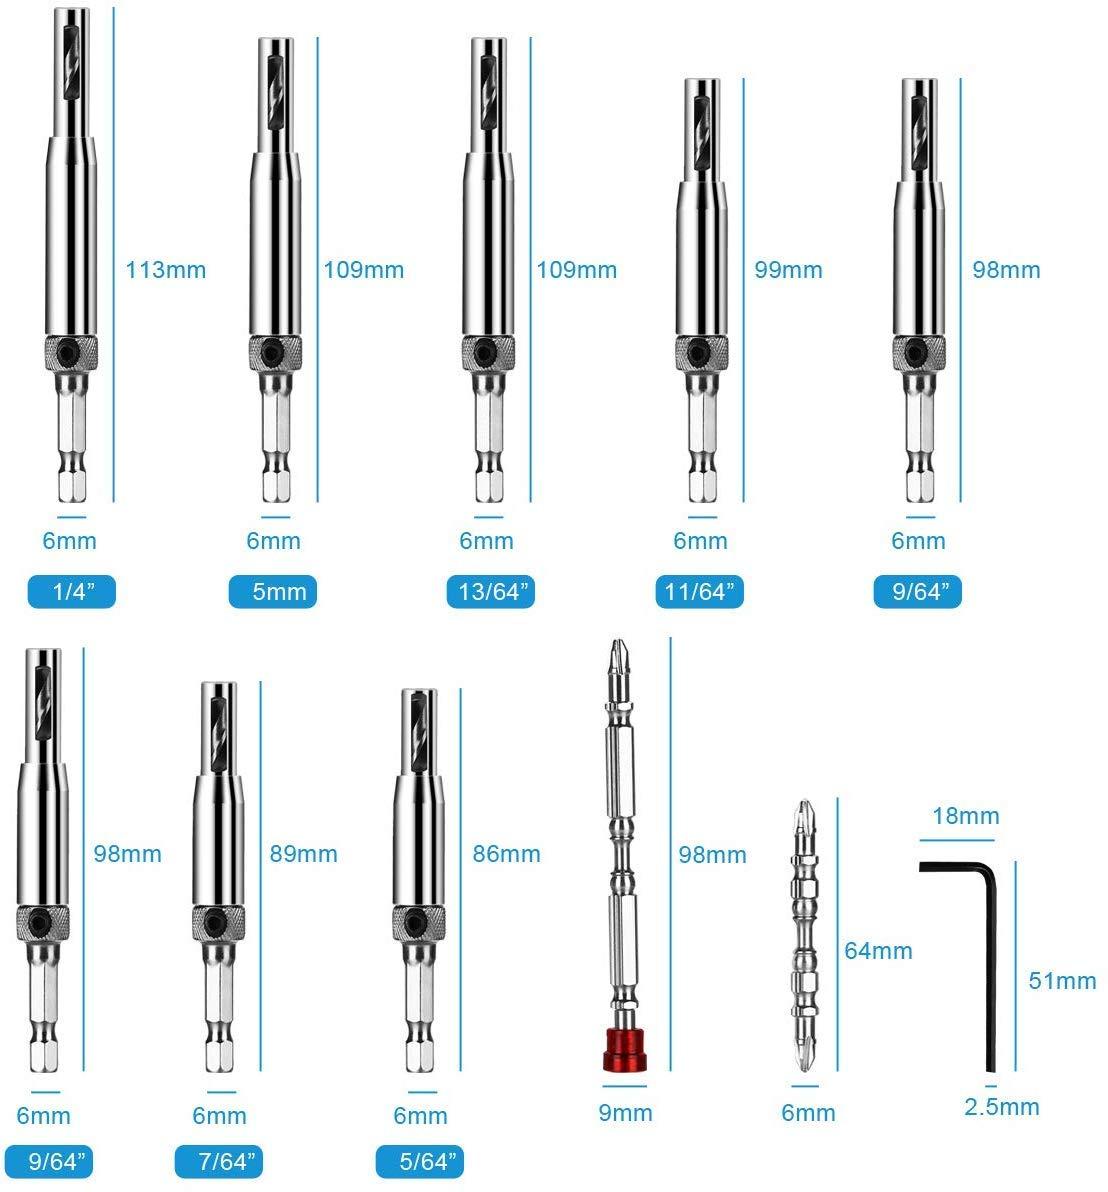 Self Centering Hinge Hardware Hole Drilling Tool Kit for Woodworking Adjustable Door Window Drill Bits flintronic Center Drill Bit Set 11 PCS Hinge Drill Bit